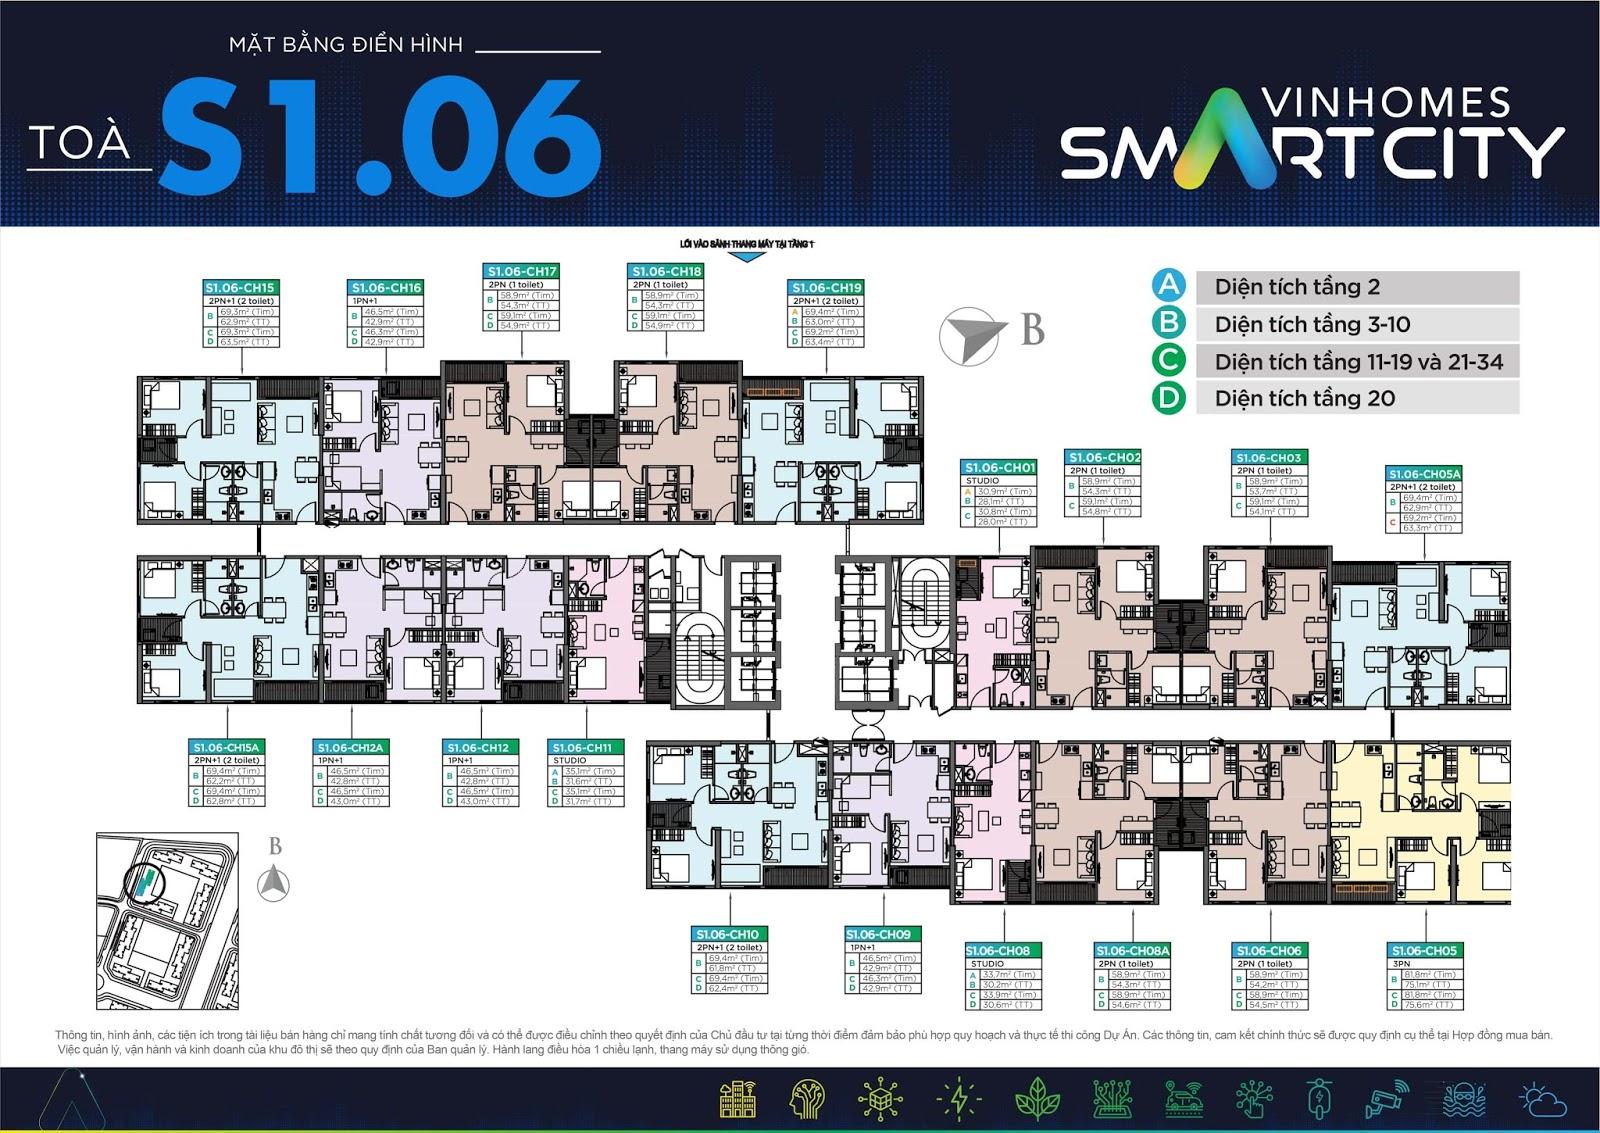 thiet ke to s106 vinhomes smart city